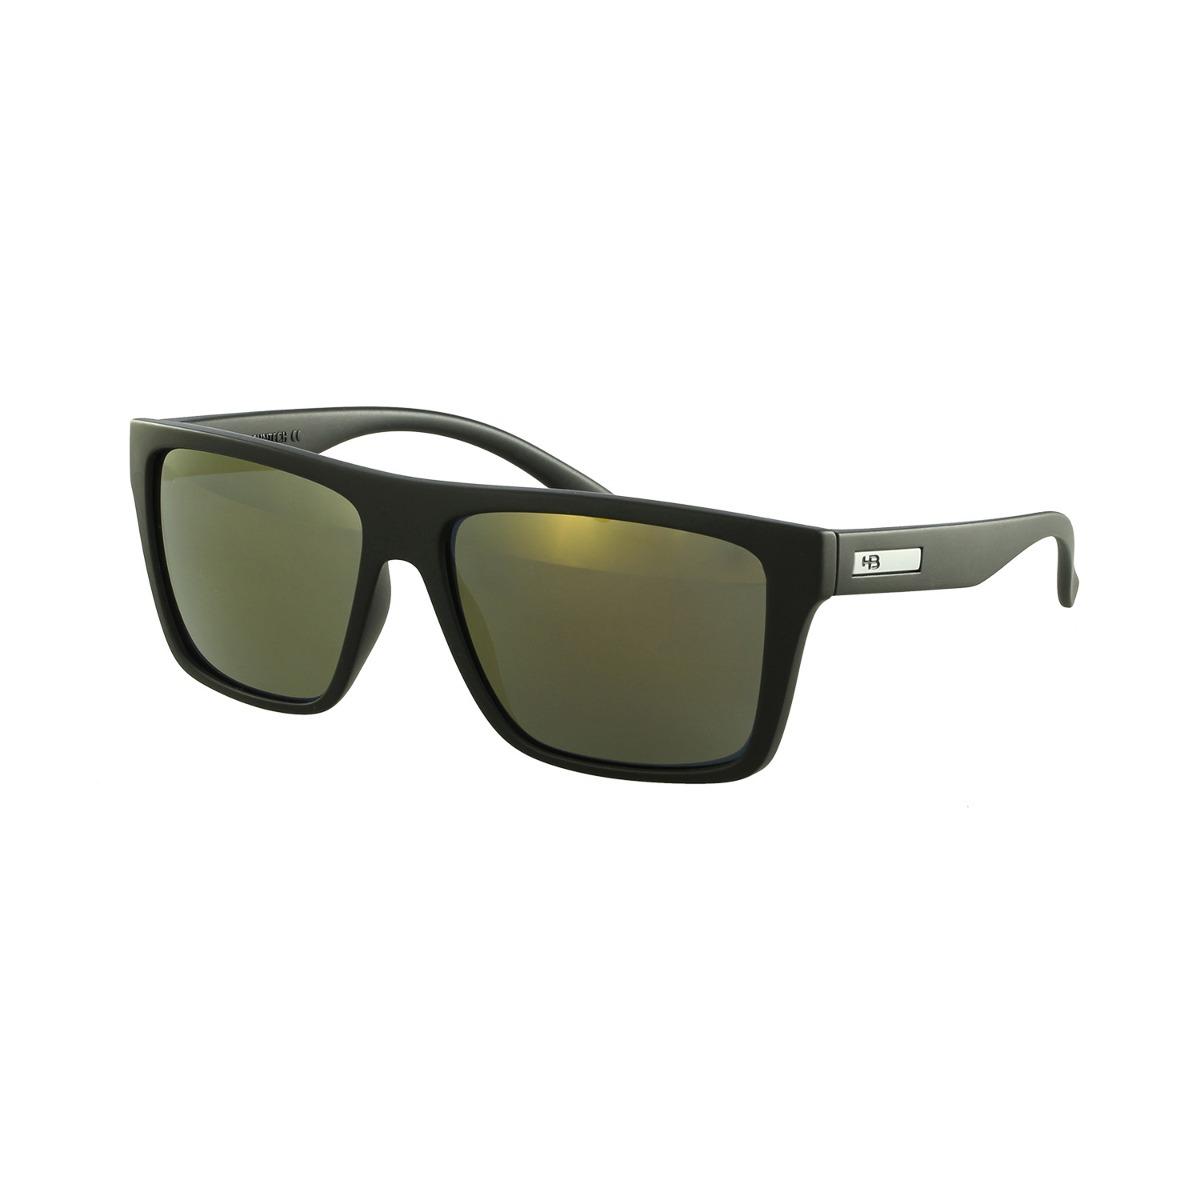 97f61cb2710f7 Óculos De Sol Hot Buttered Casual Preto - R  309,00 em Mercado Livre